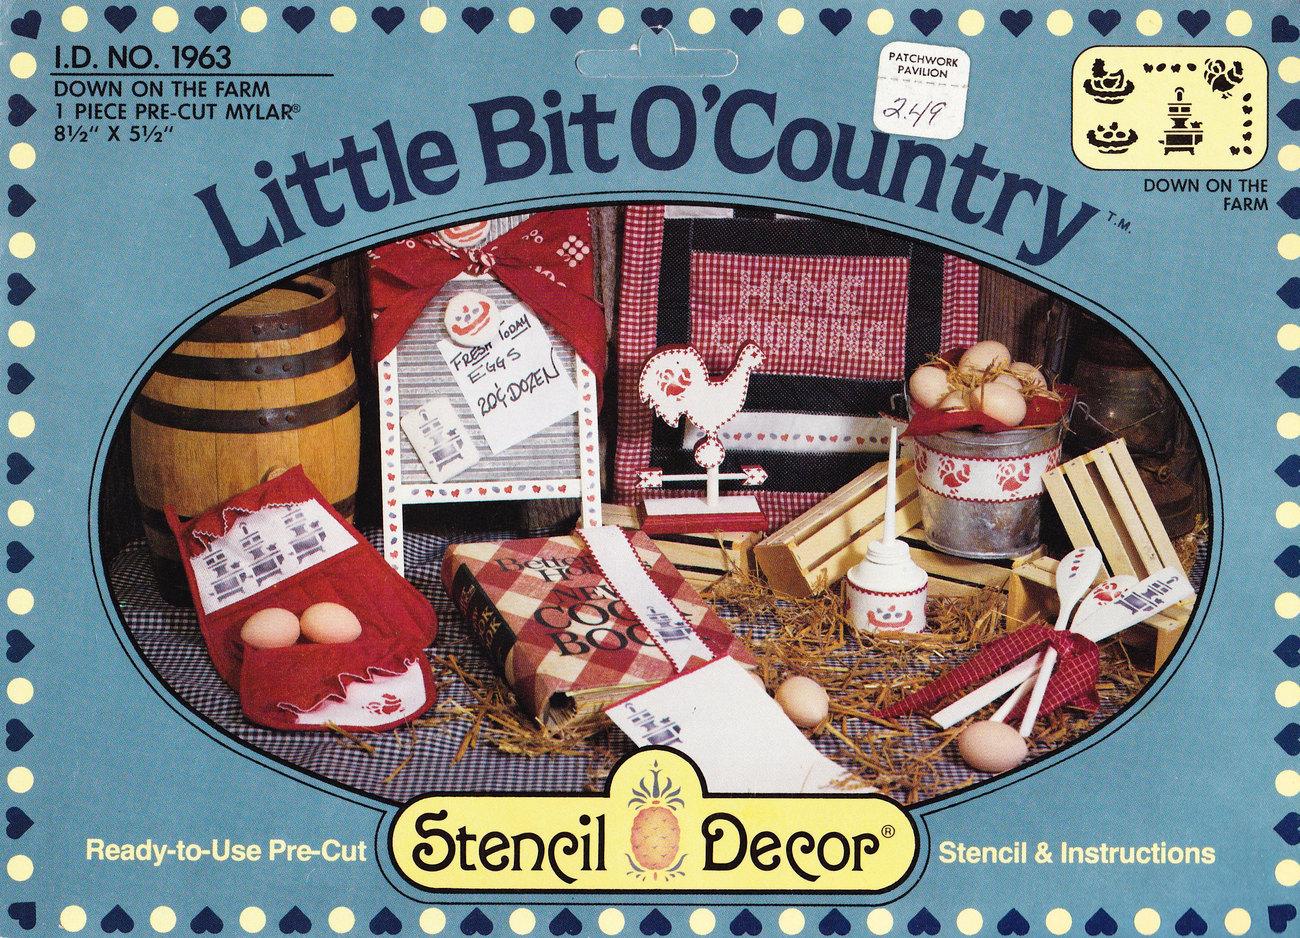 STENCIL DECOR LITTLE BIT O'COUNTRY DOWN ON THE FARM - $2.00